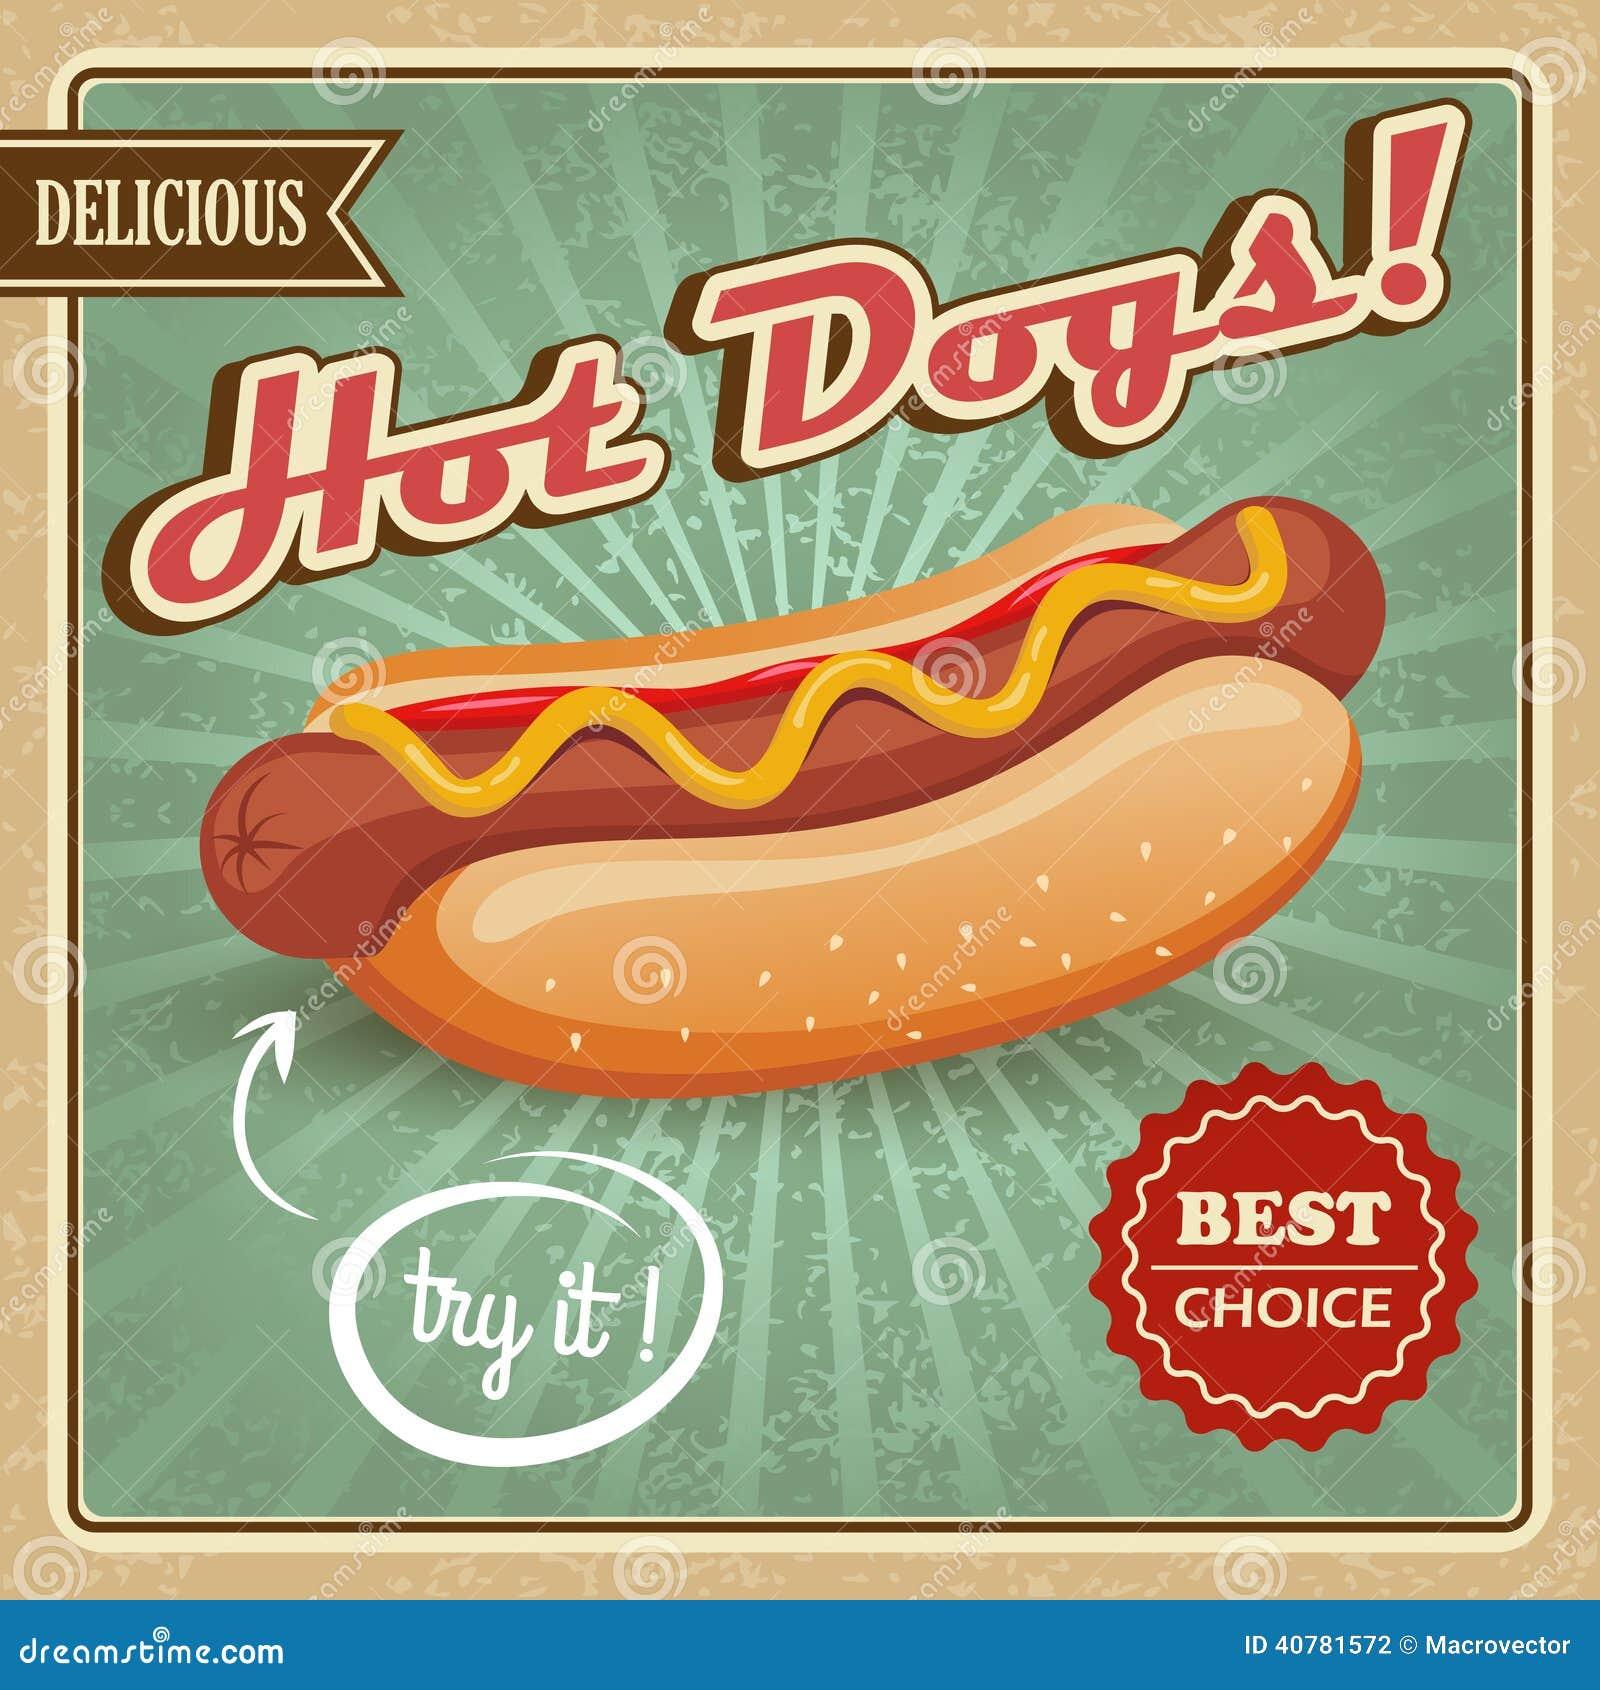 Raw Dog Food Poster